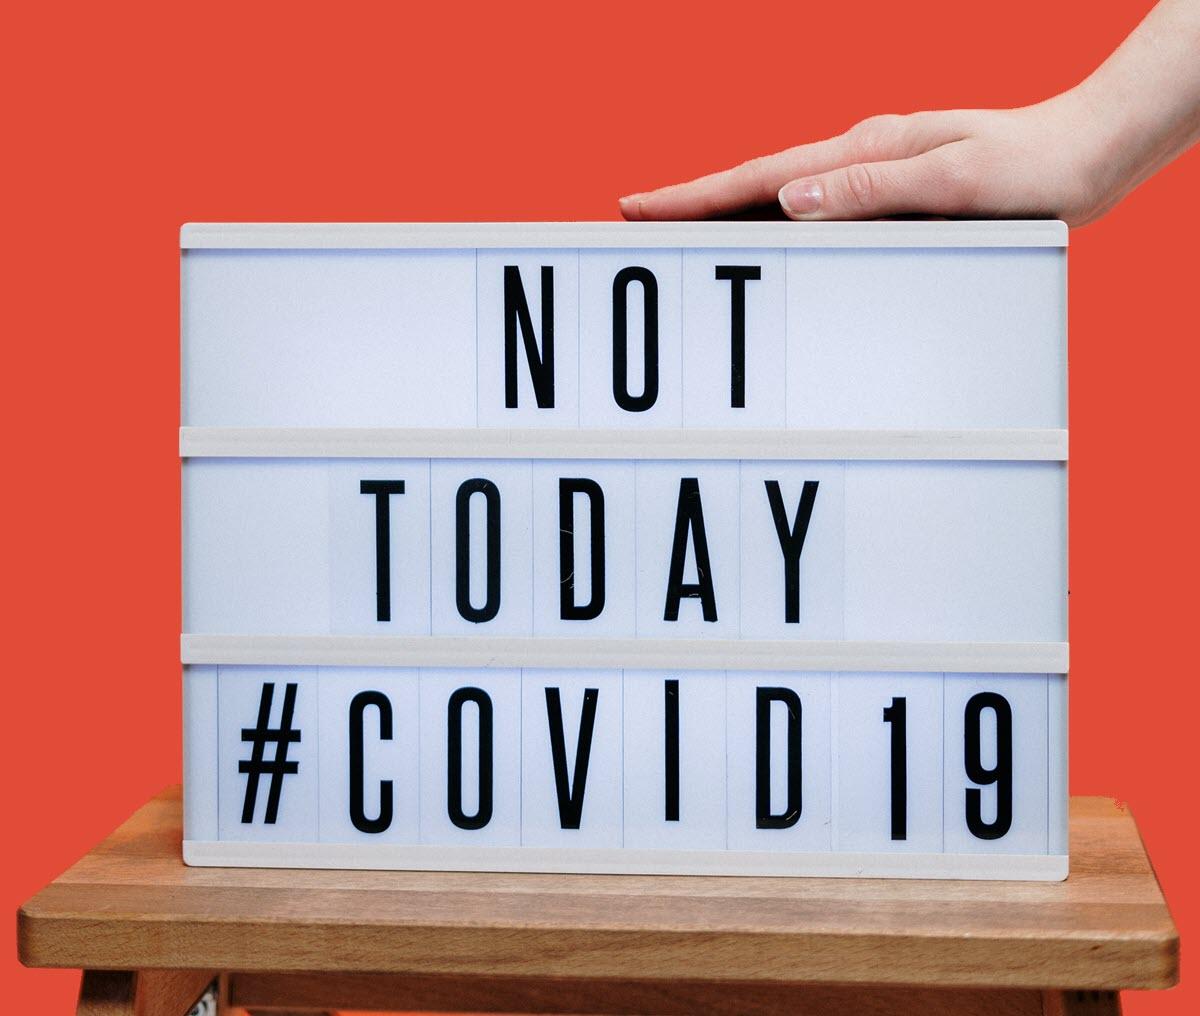 Covid 19 Resources